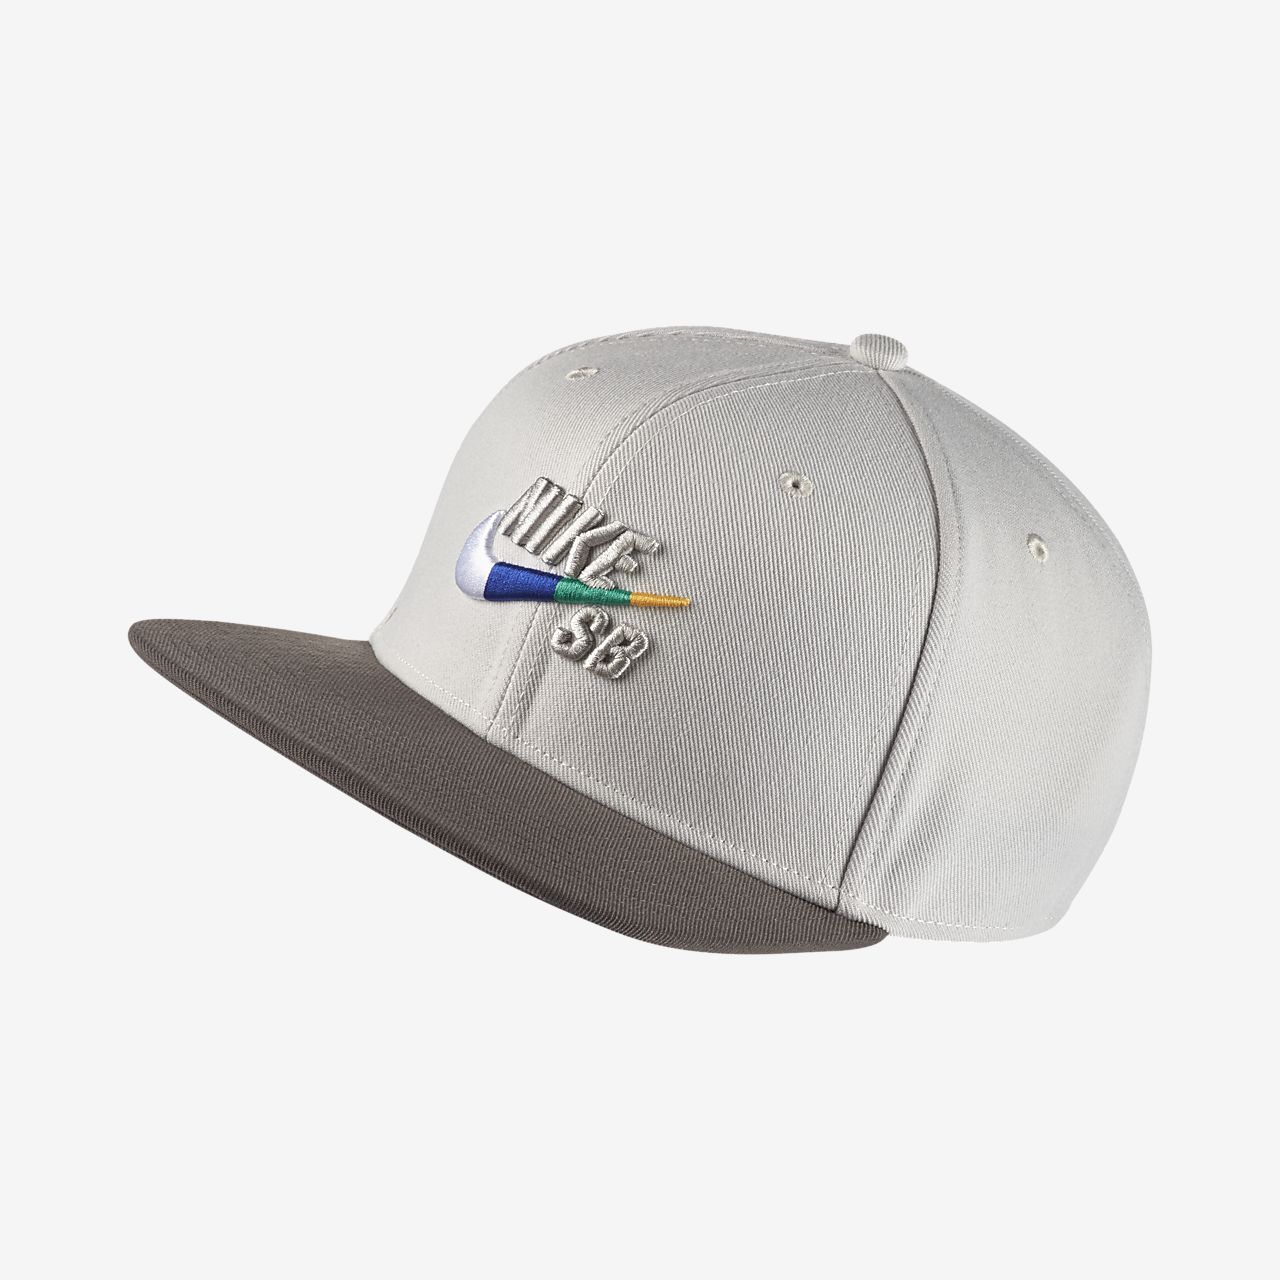 Nike SB Icon Verstellbare Kappe - Schwarz ydEePn